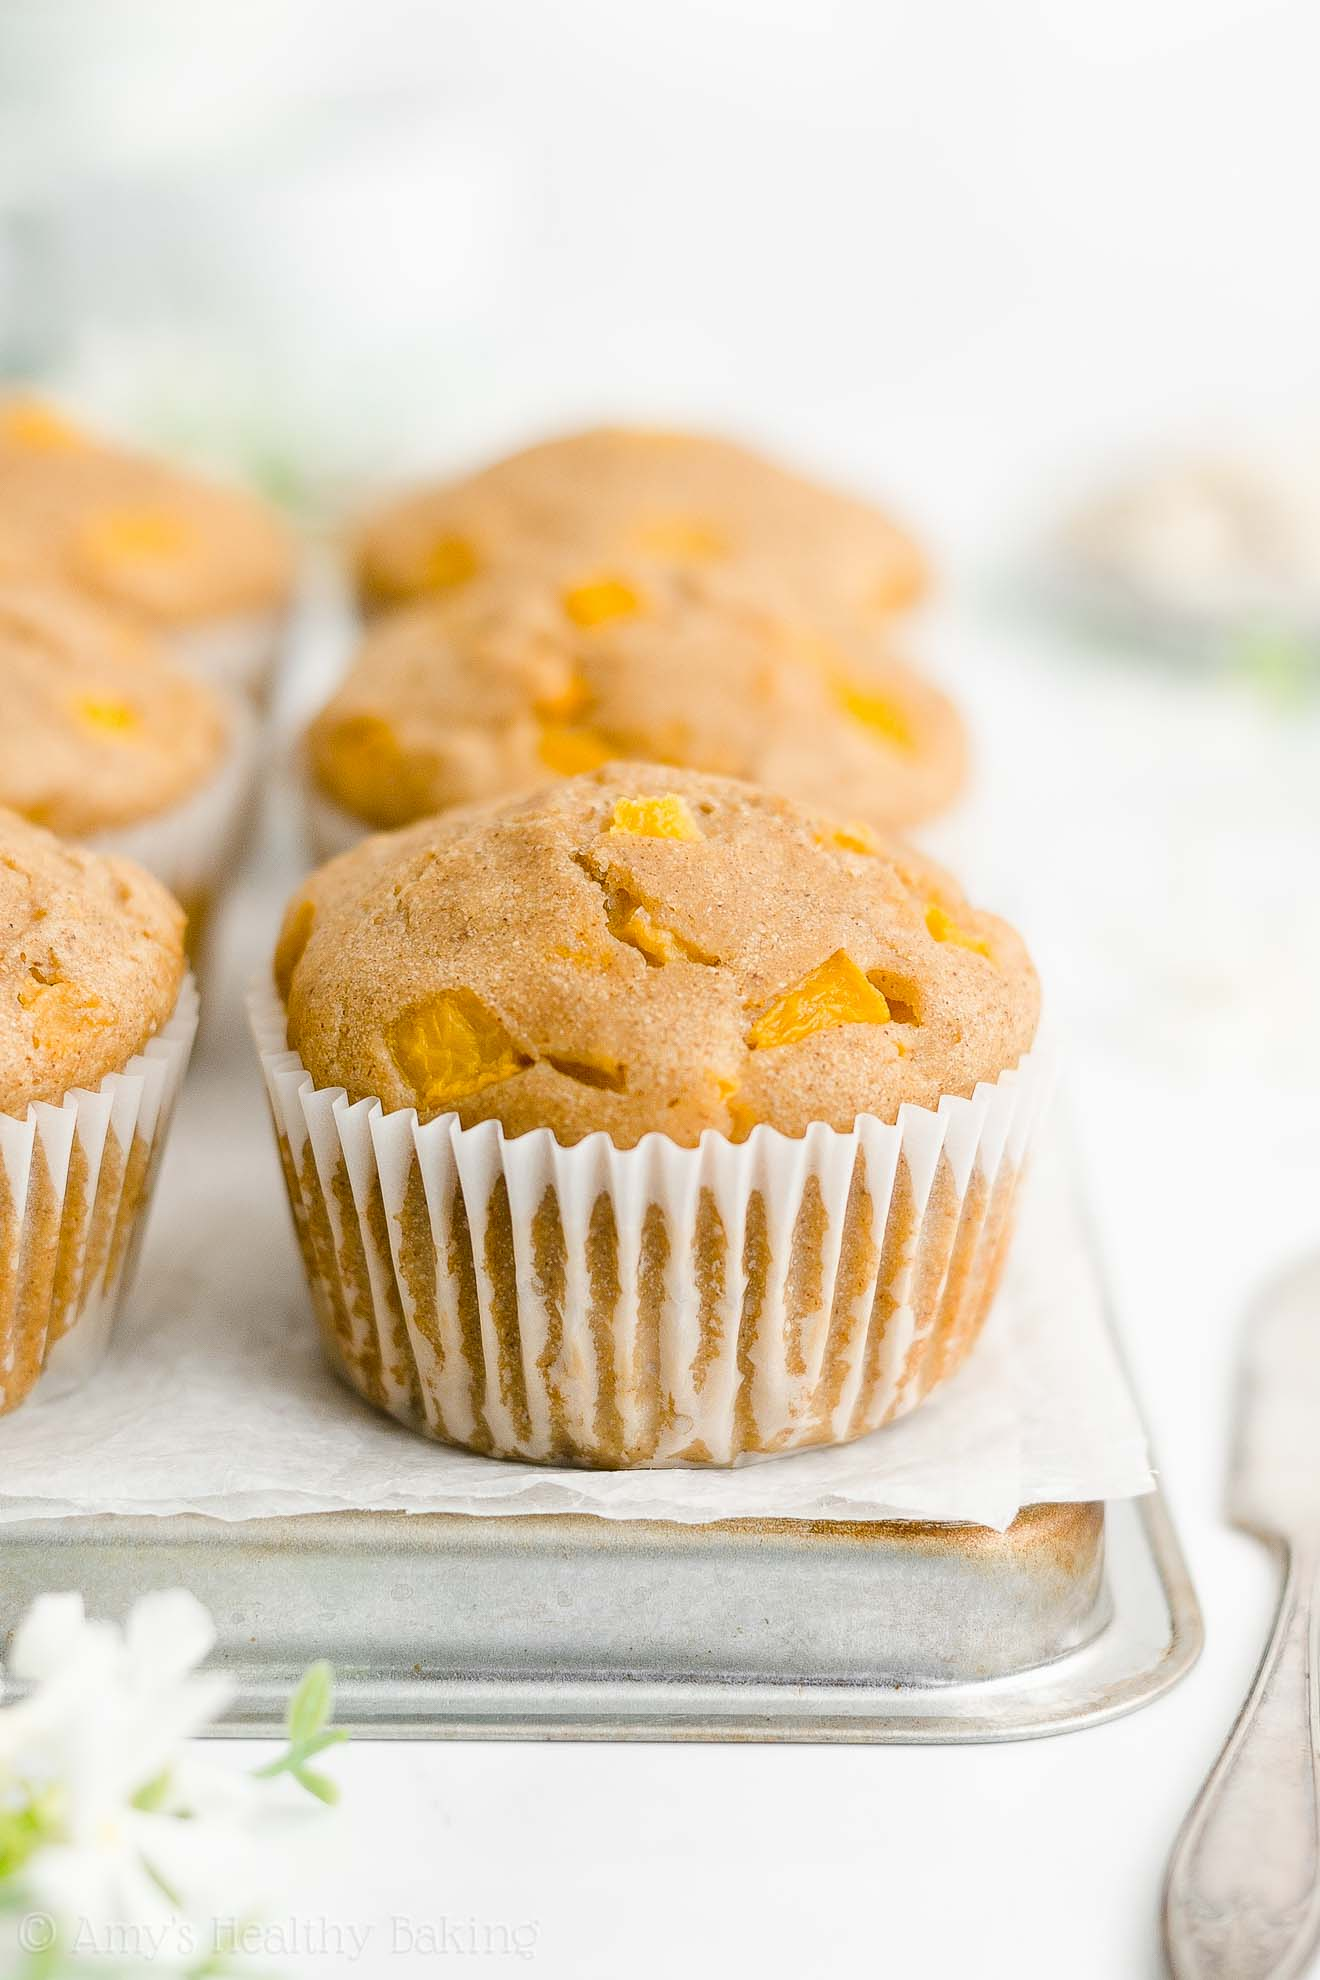 Best Easy Healthy Homemade Low Calorie No Sugar Gluten Free Peach Muffins